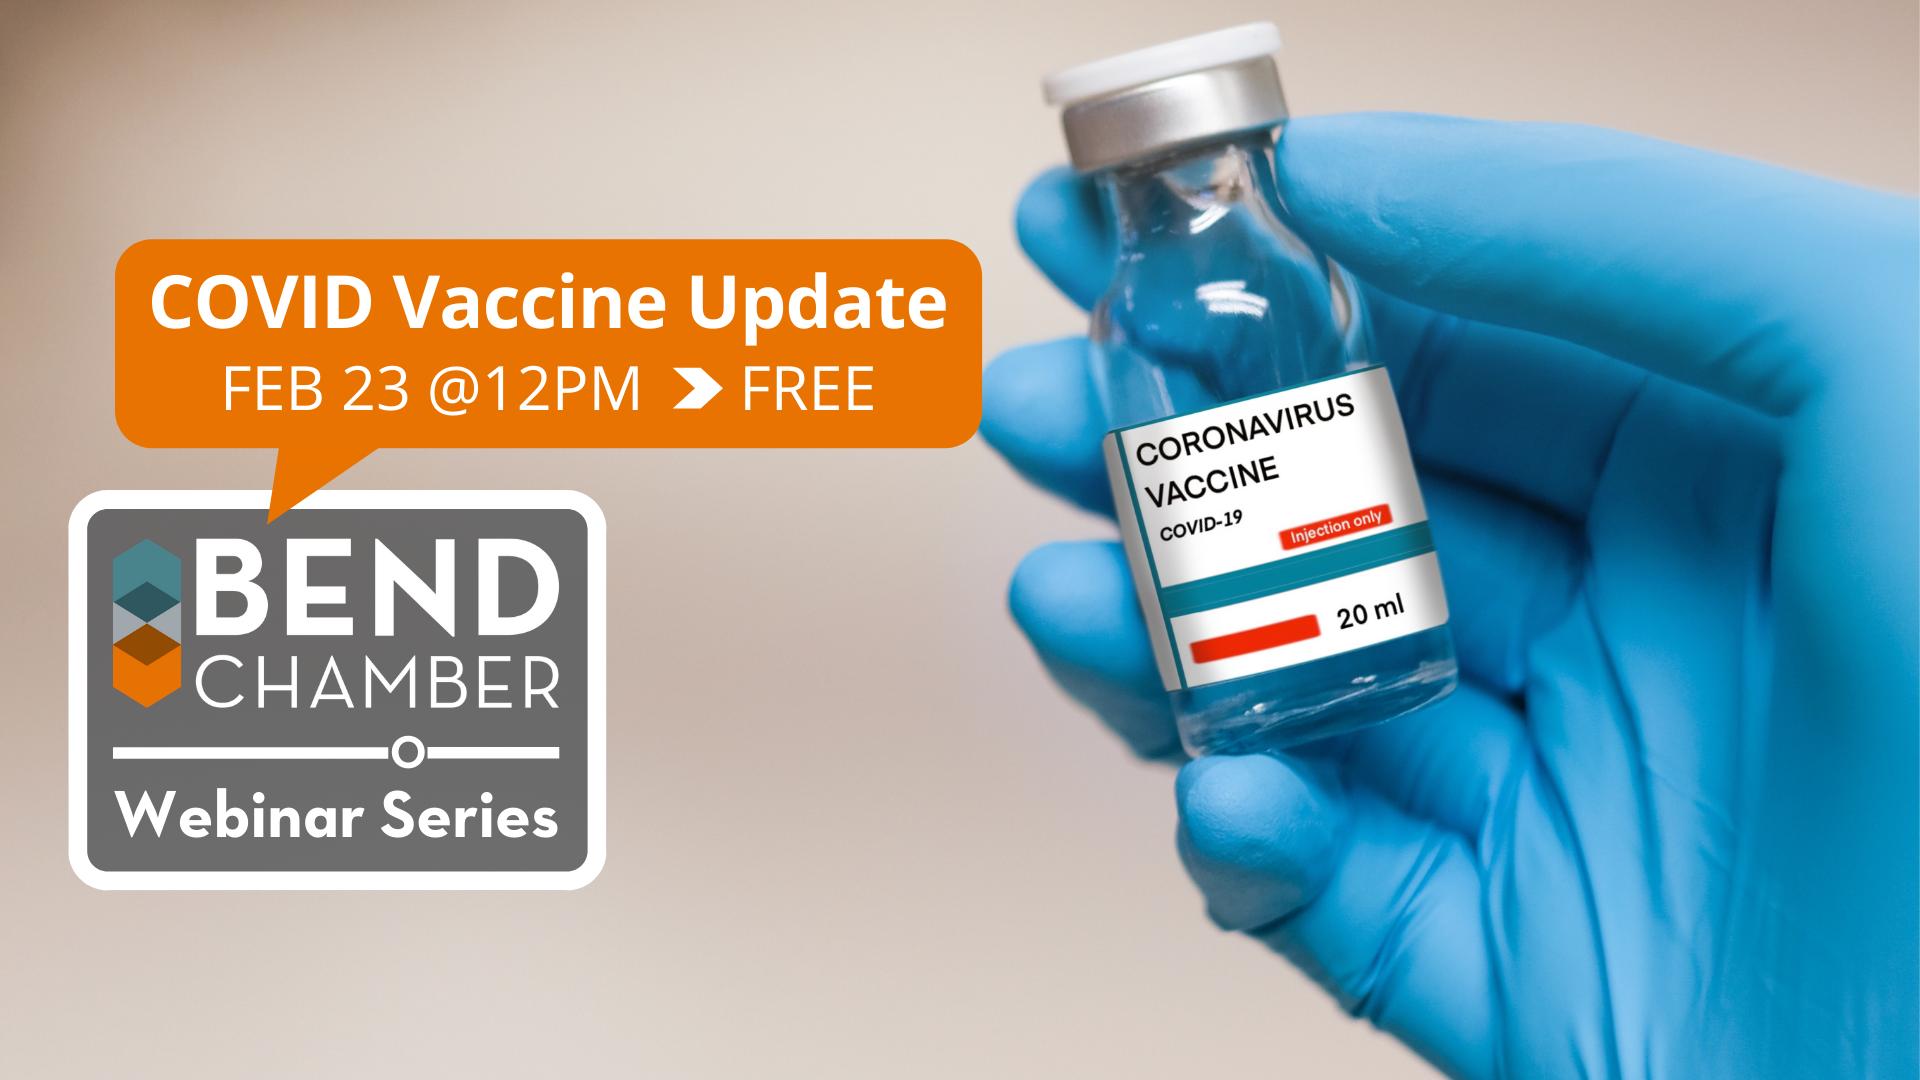 COVID Vaccine Updates